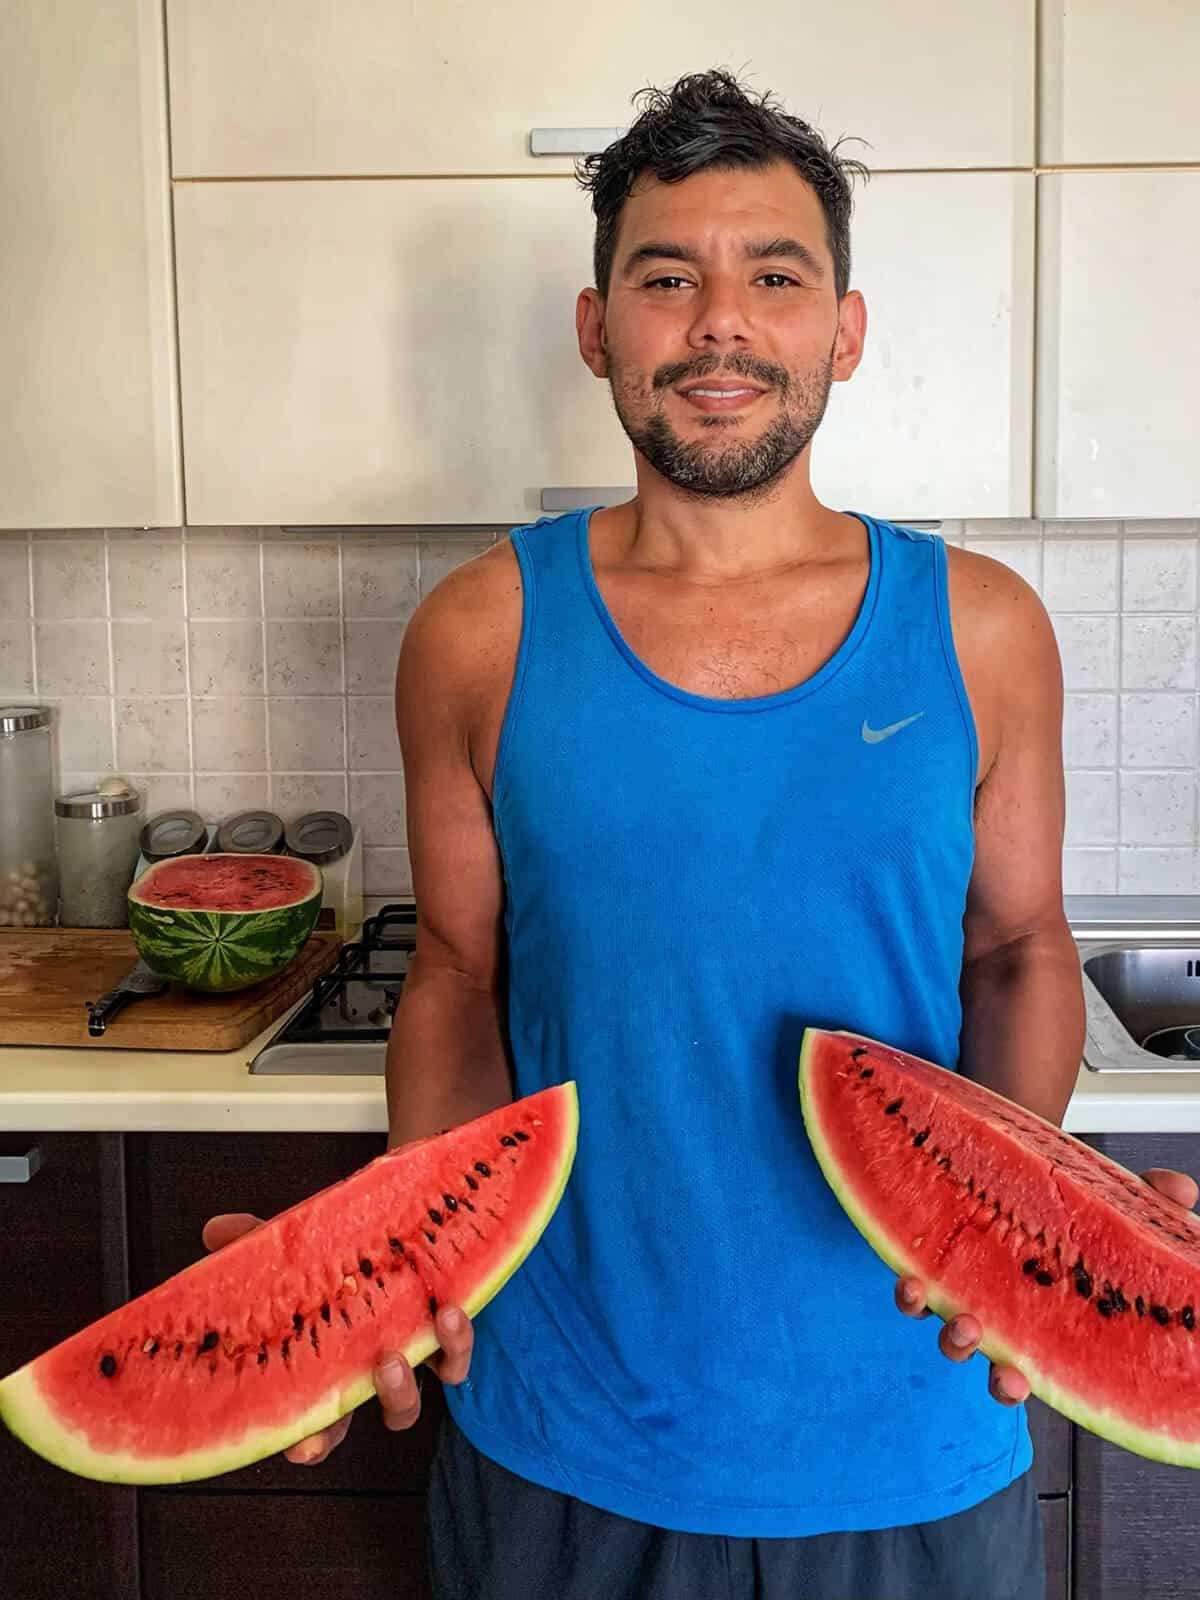 Gustavo holding watermelon